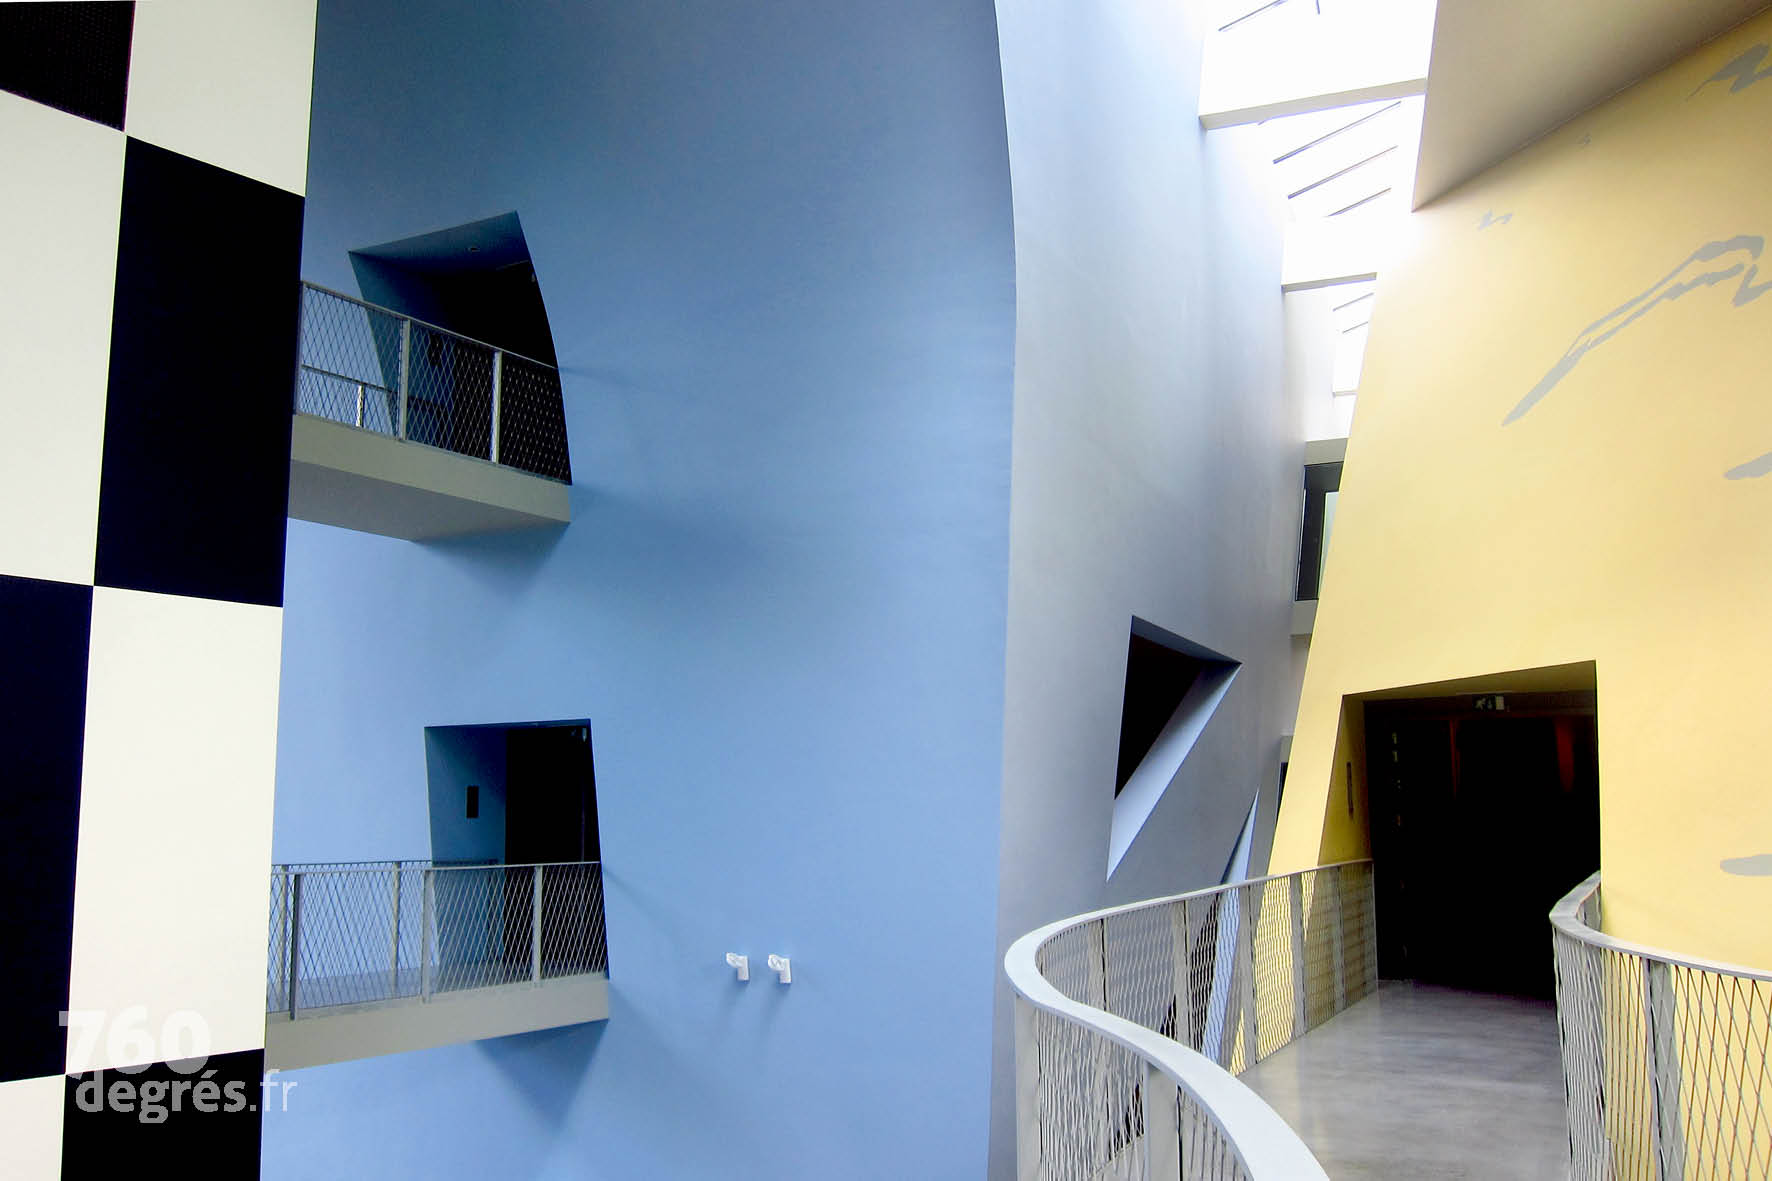 photos-760degres-musee-herge-louvain-la-neuve-tintin-3